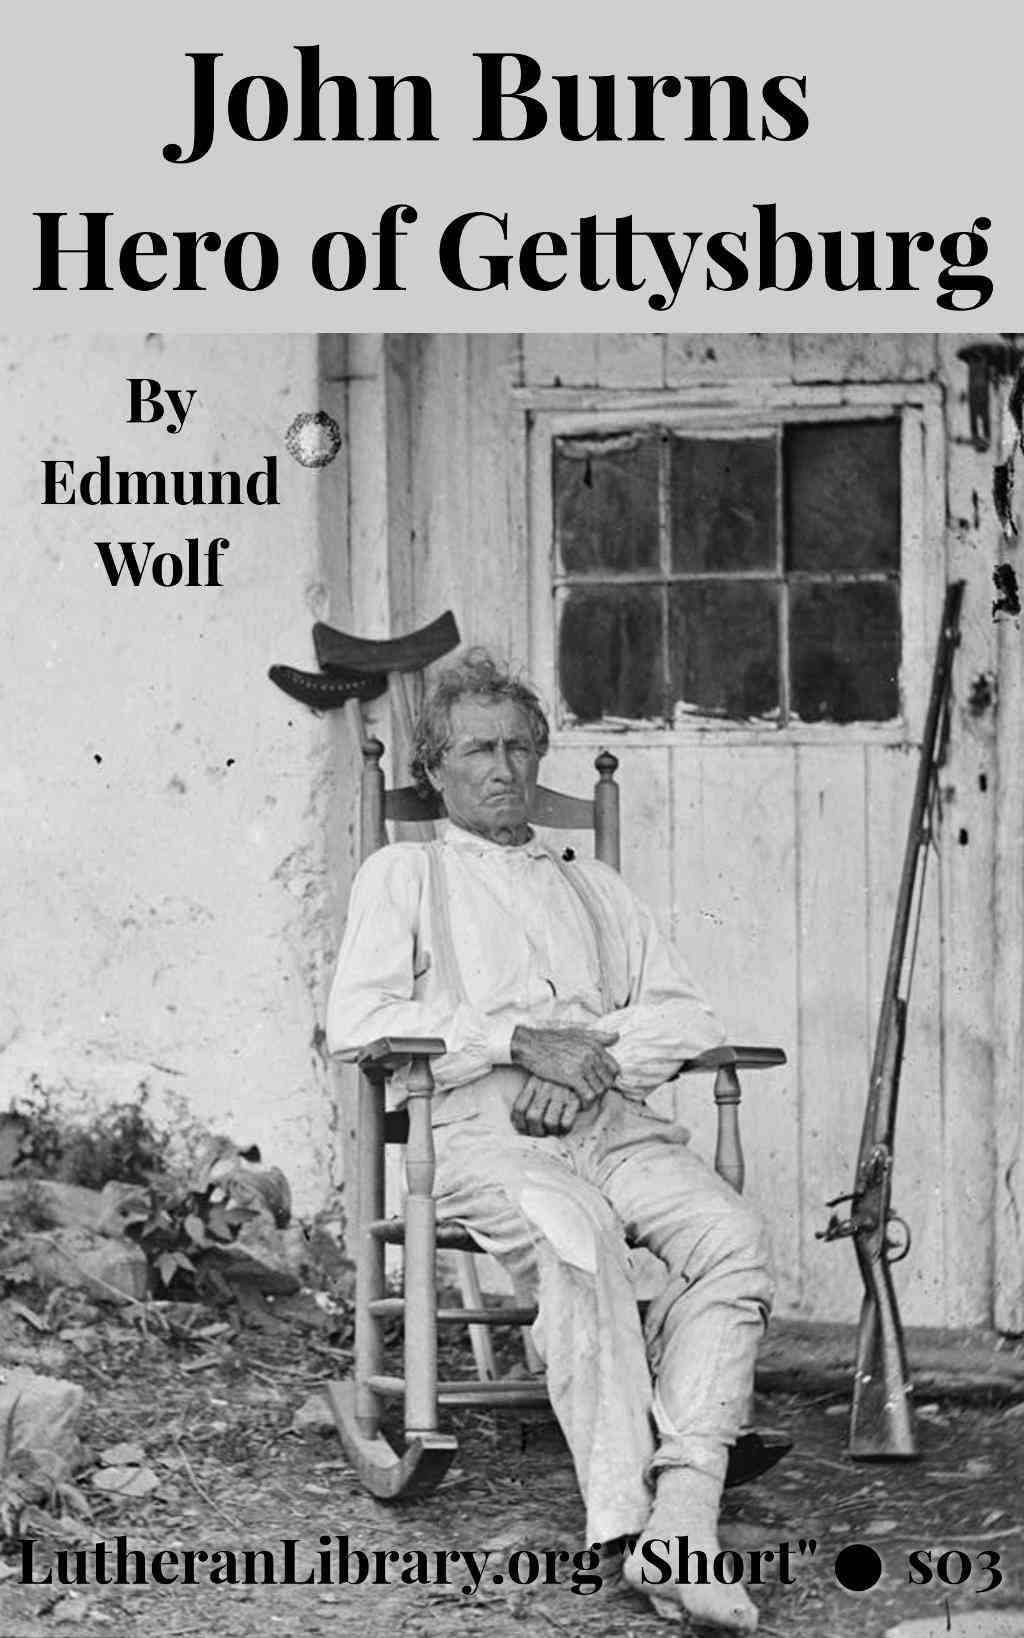 John Burns: The Hero of Gettysburg by Edmund Jacob Wolf